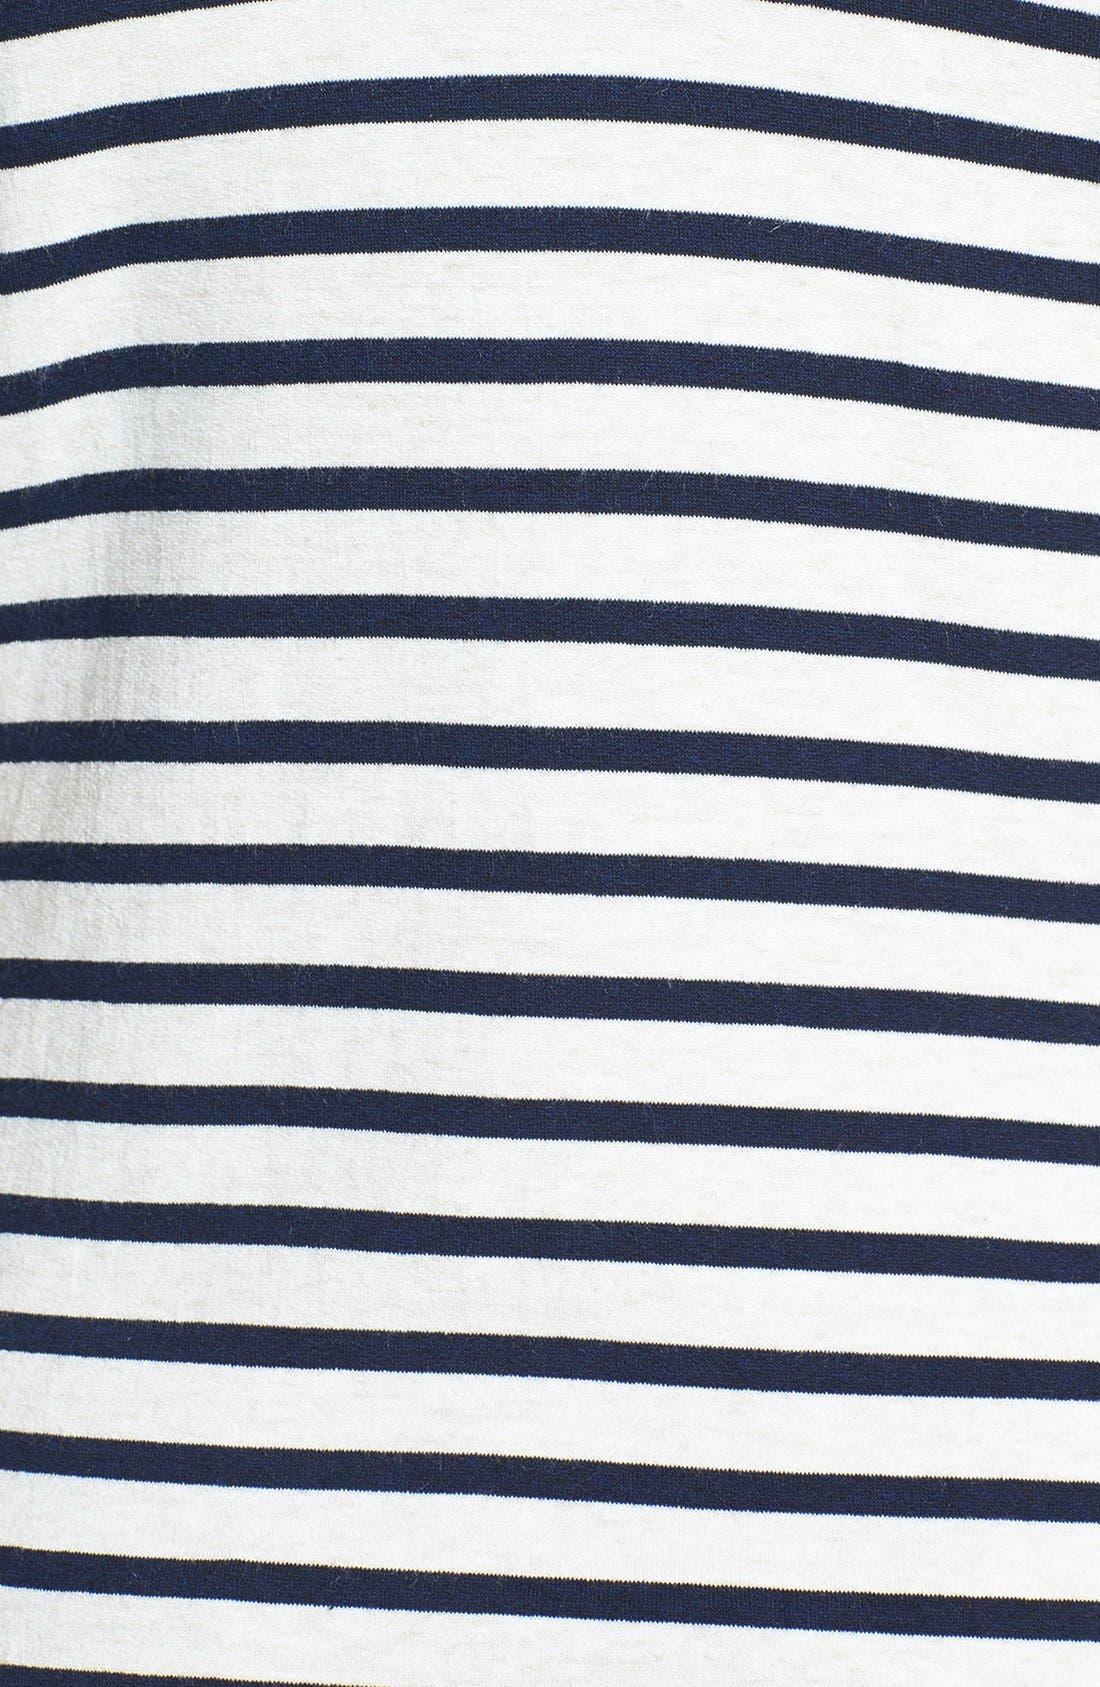 Alternate Image 3  - Trina Turk 'Matey' Stripe French Terry Tank